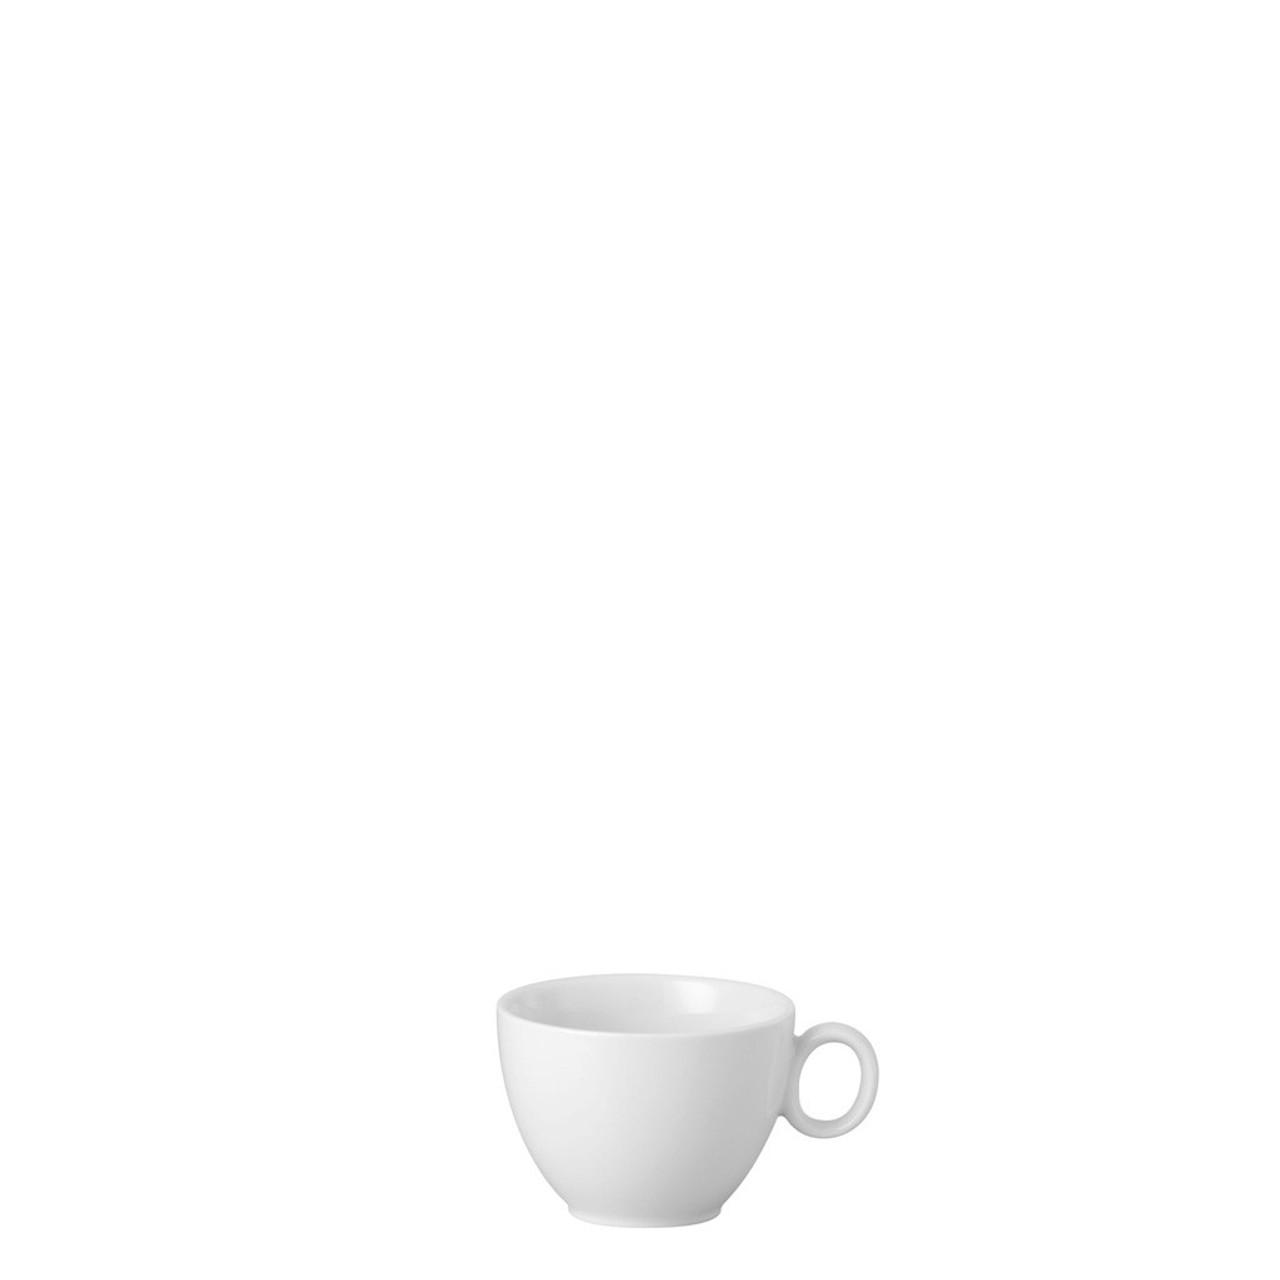 Espresso Cup 2 ounce | Thomas Loft White  sc 1 st  Rosenthal & Espresso Cup 2 ounce | Loft White| Rosenthal Shop